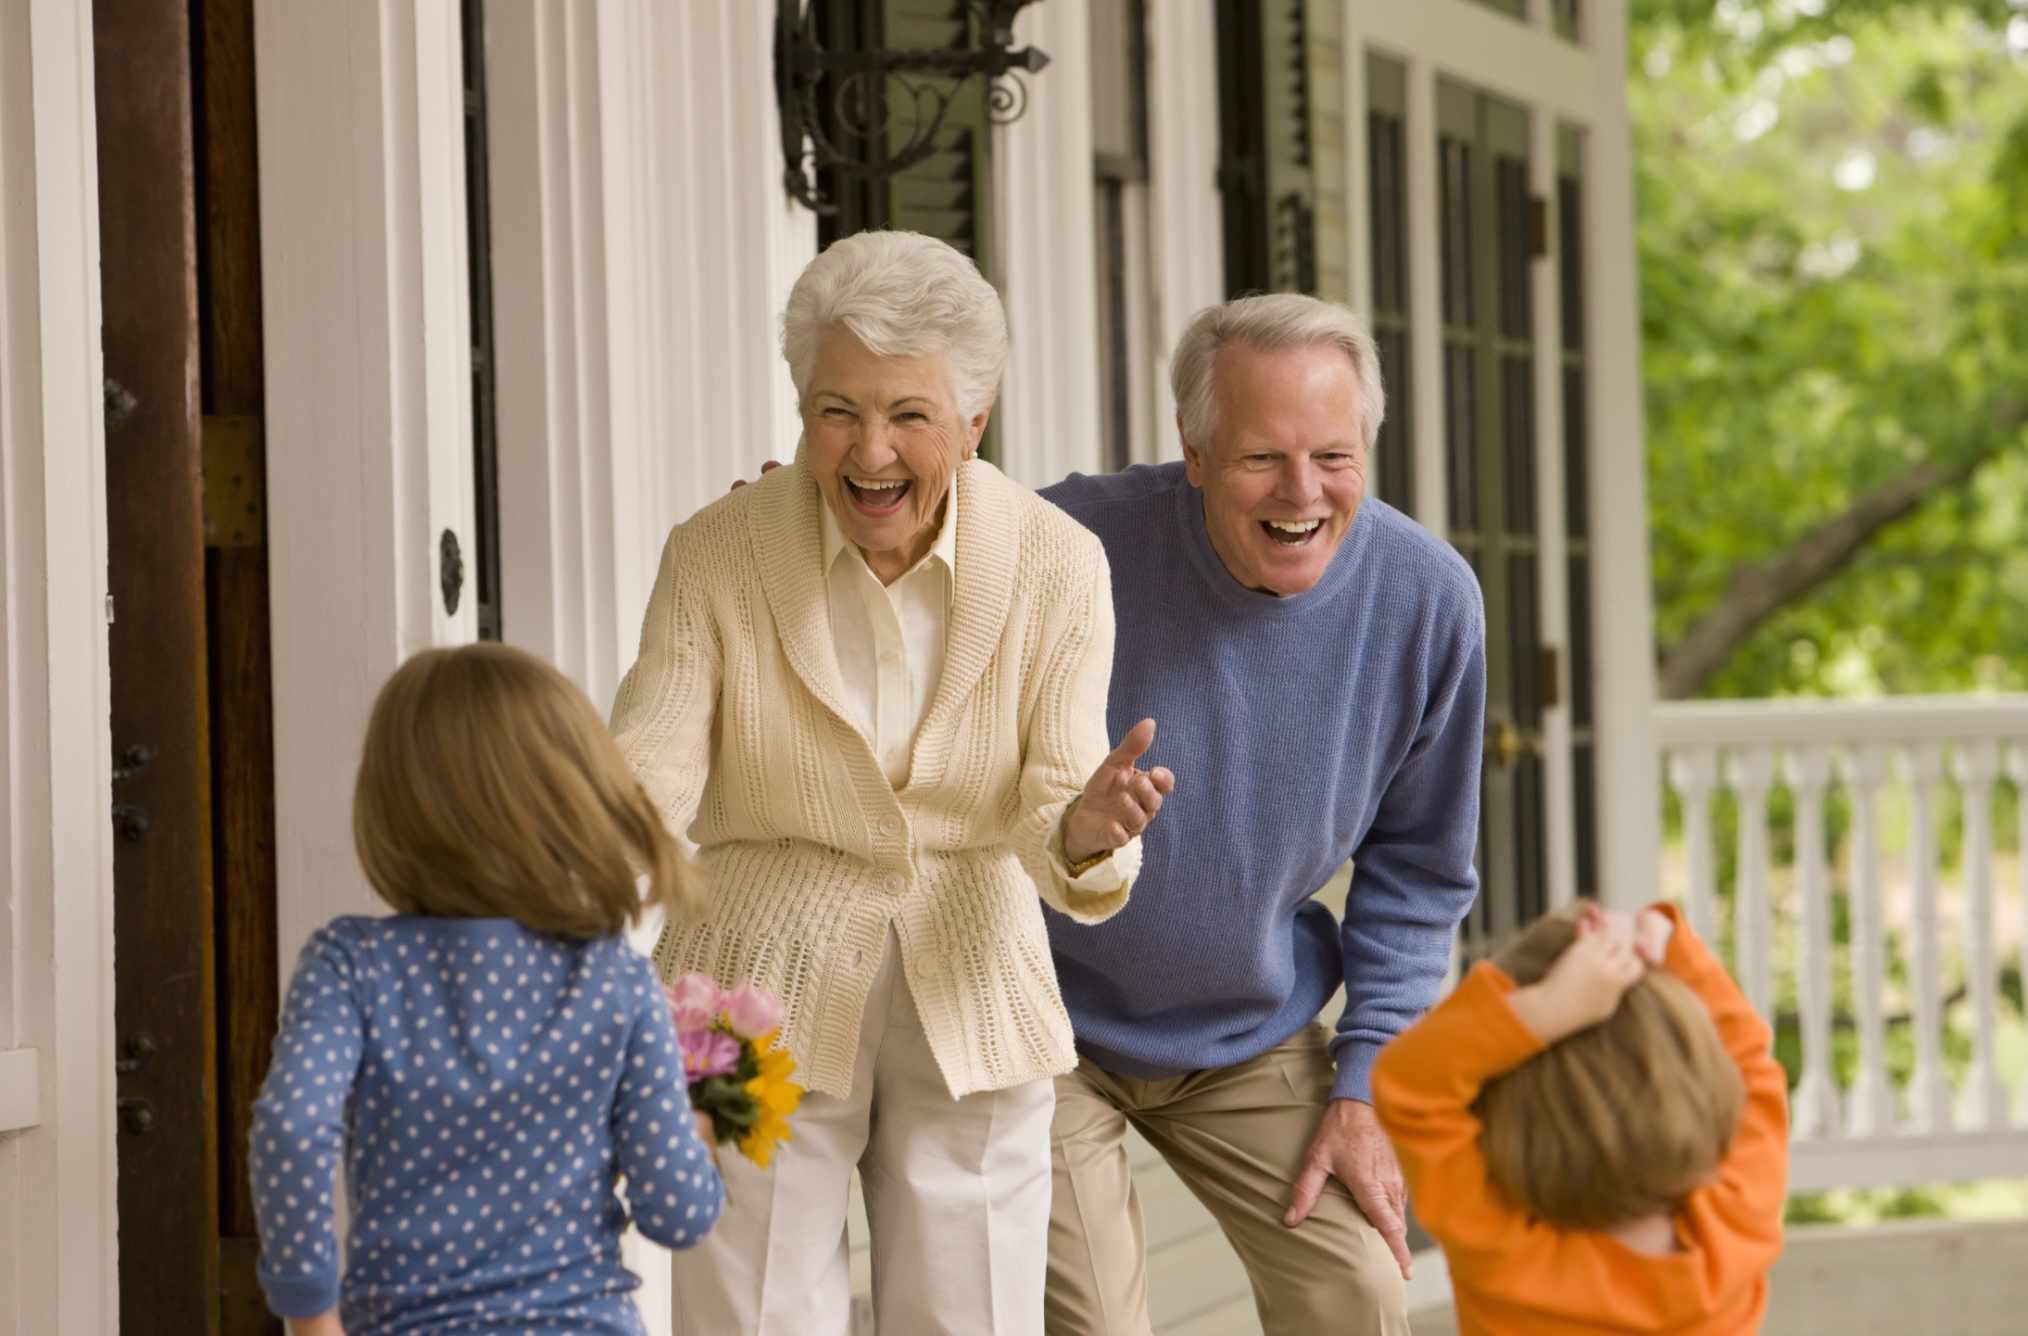 Grandparents being welcomed by grandchildren